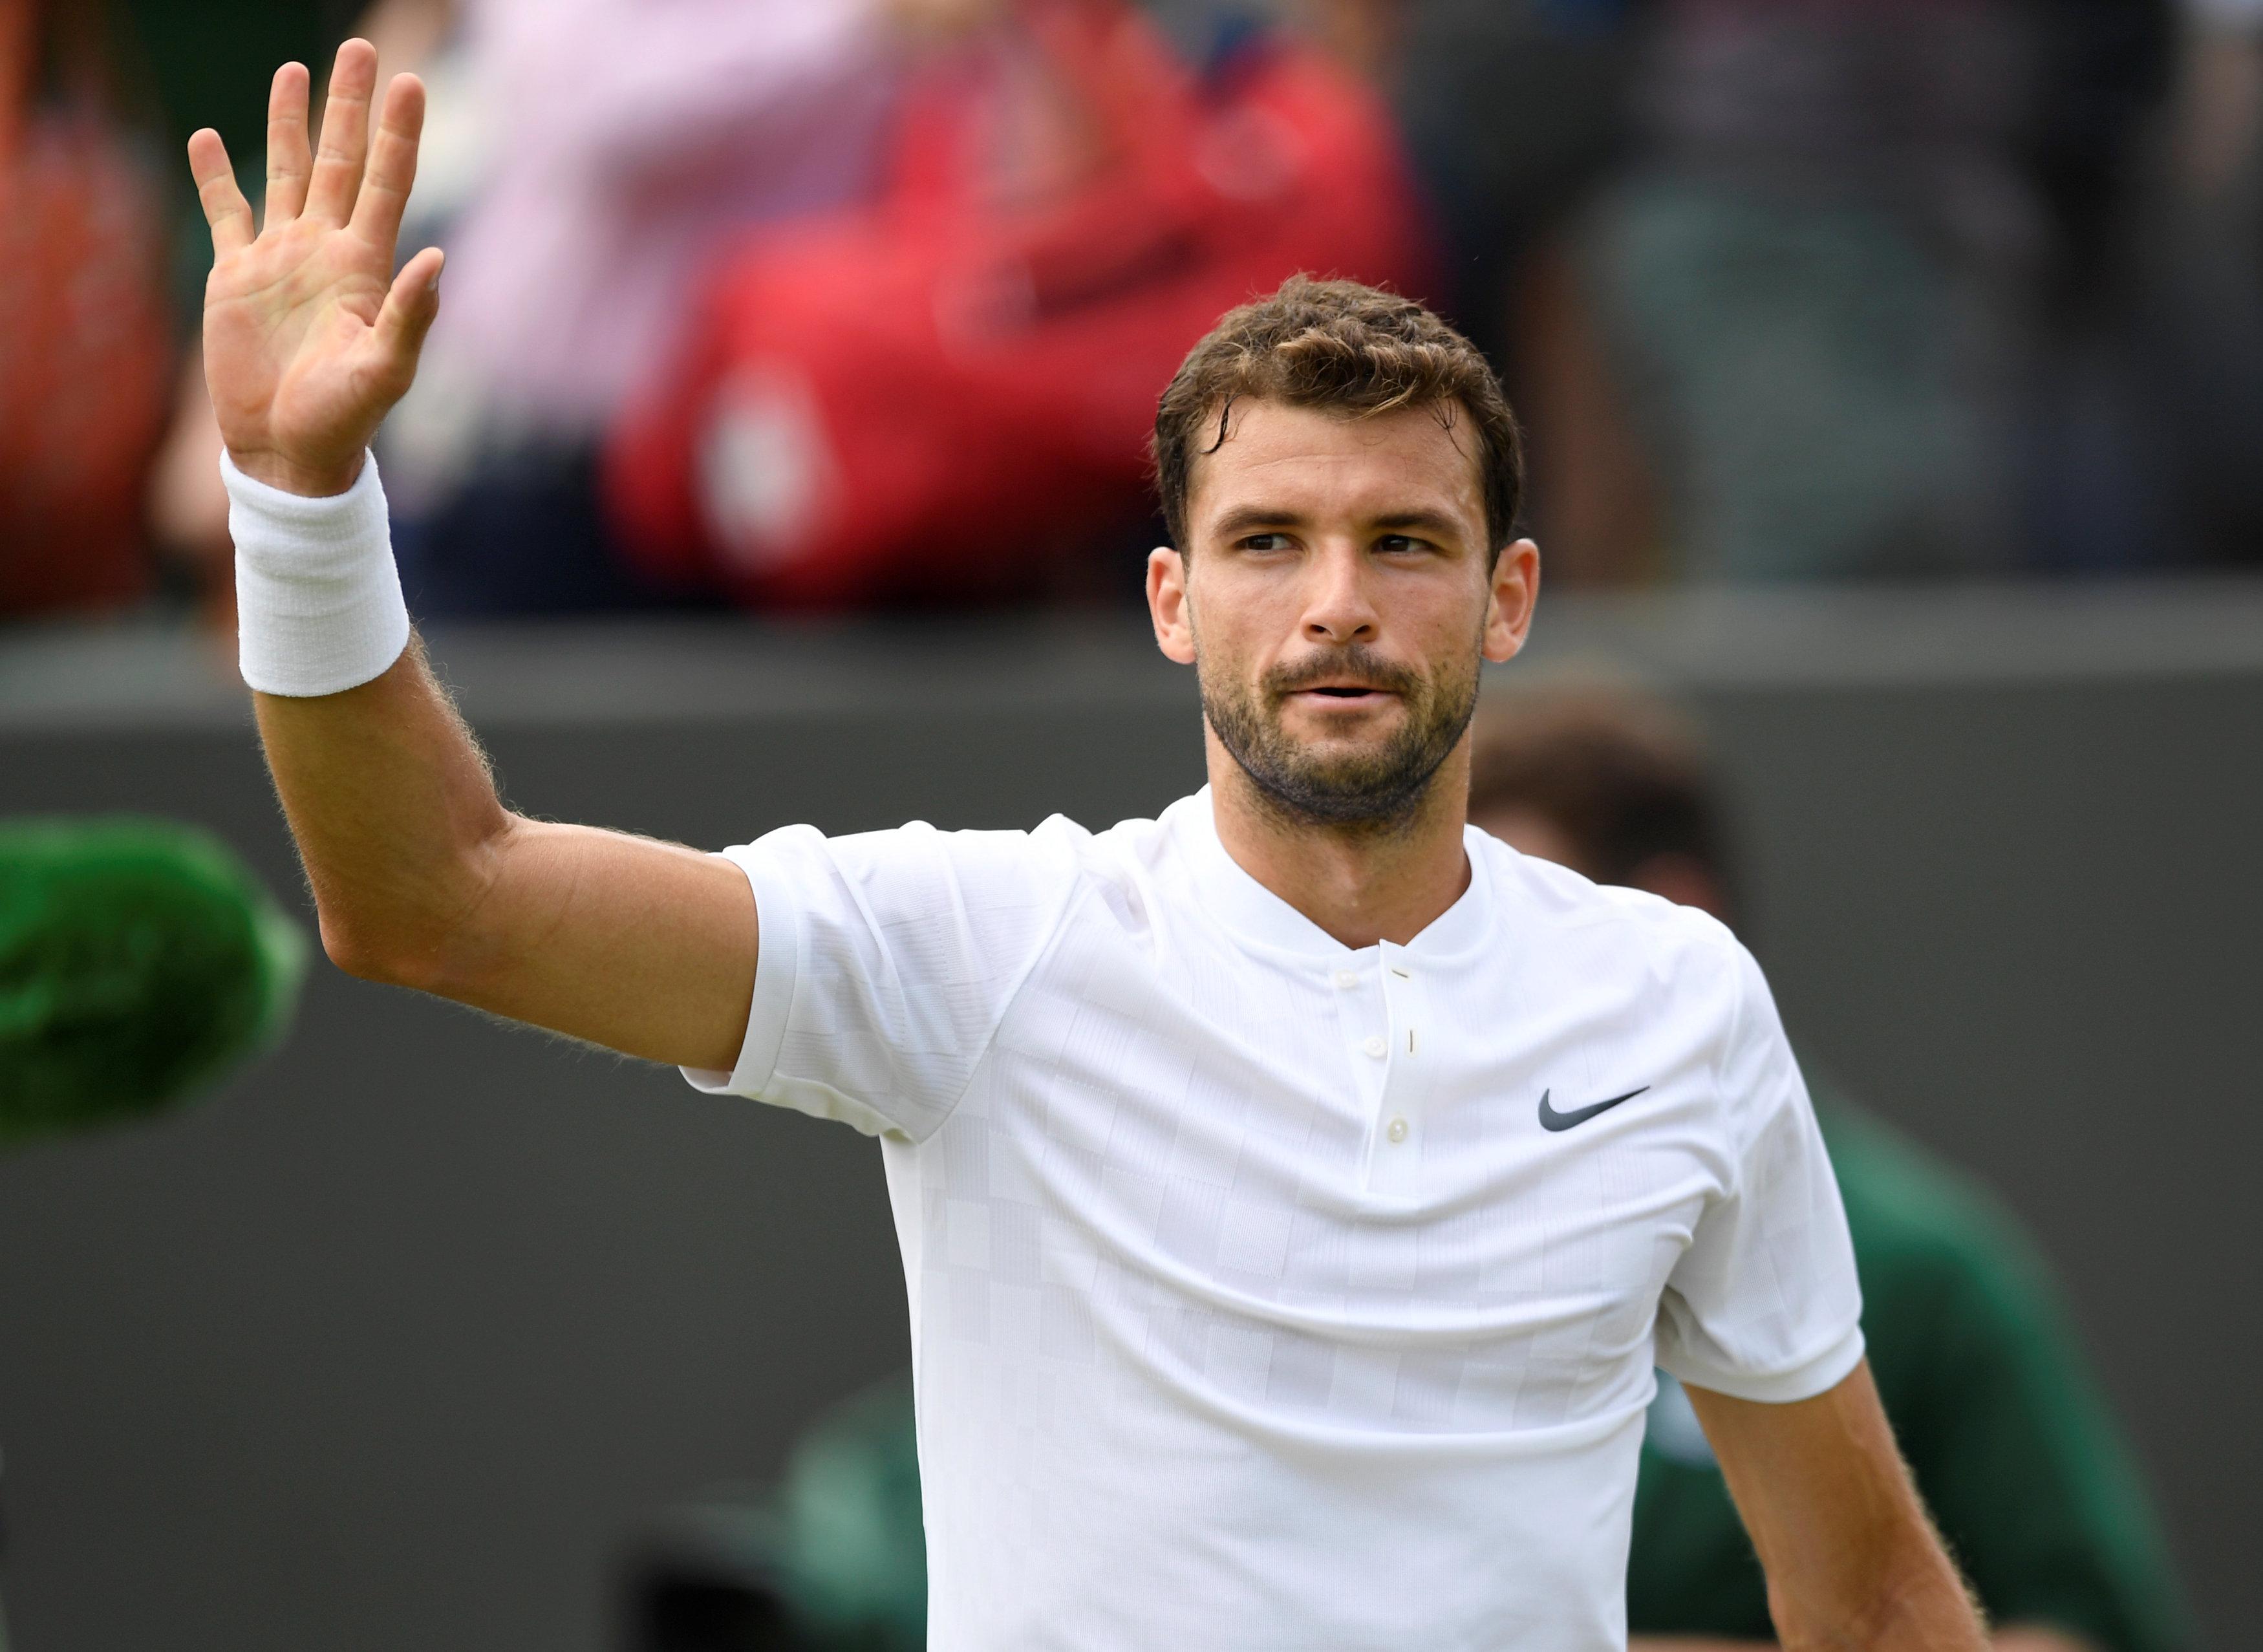 Tennis: Grigor Dimitrov gets easy ride into fourth round of Wimbledon